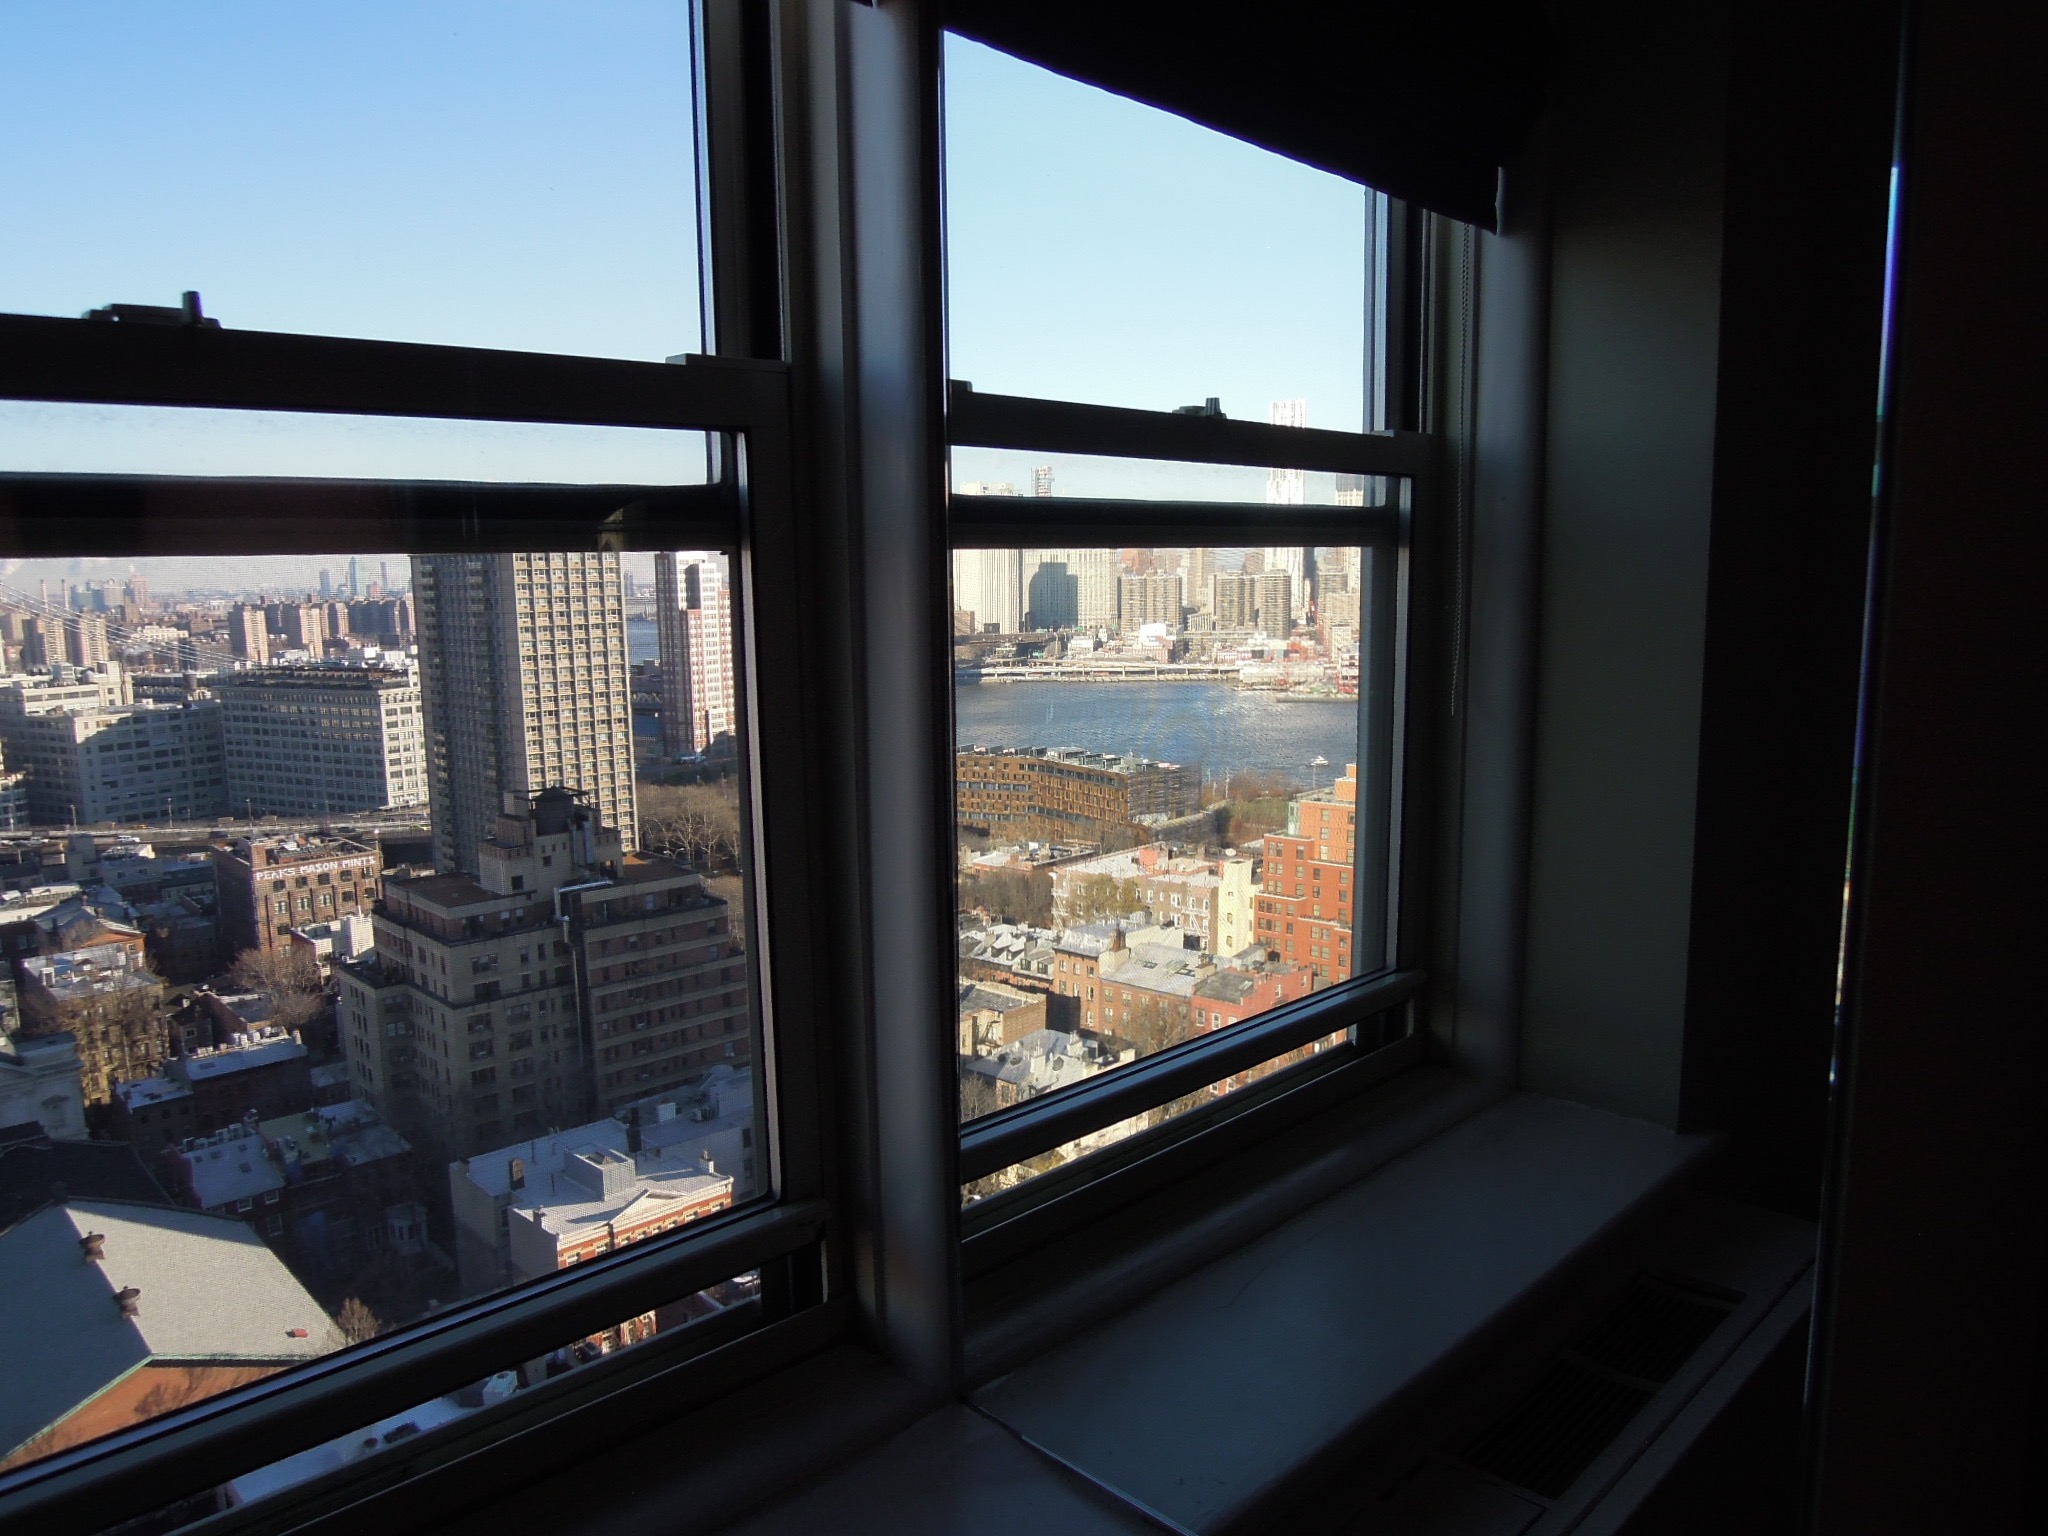 dbl window